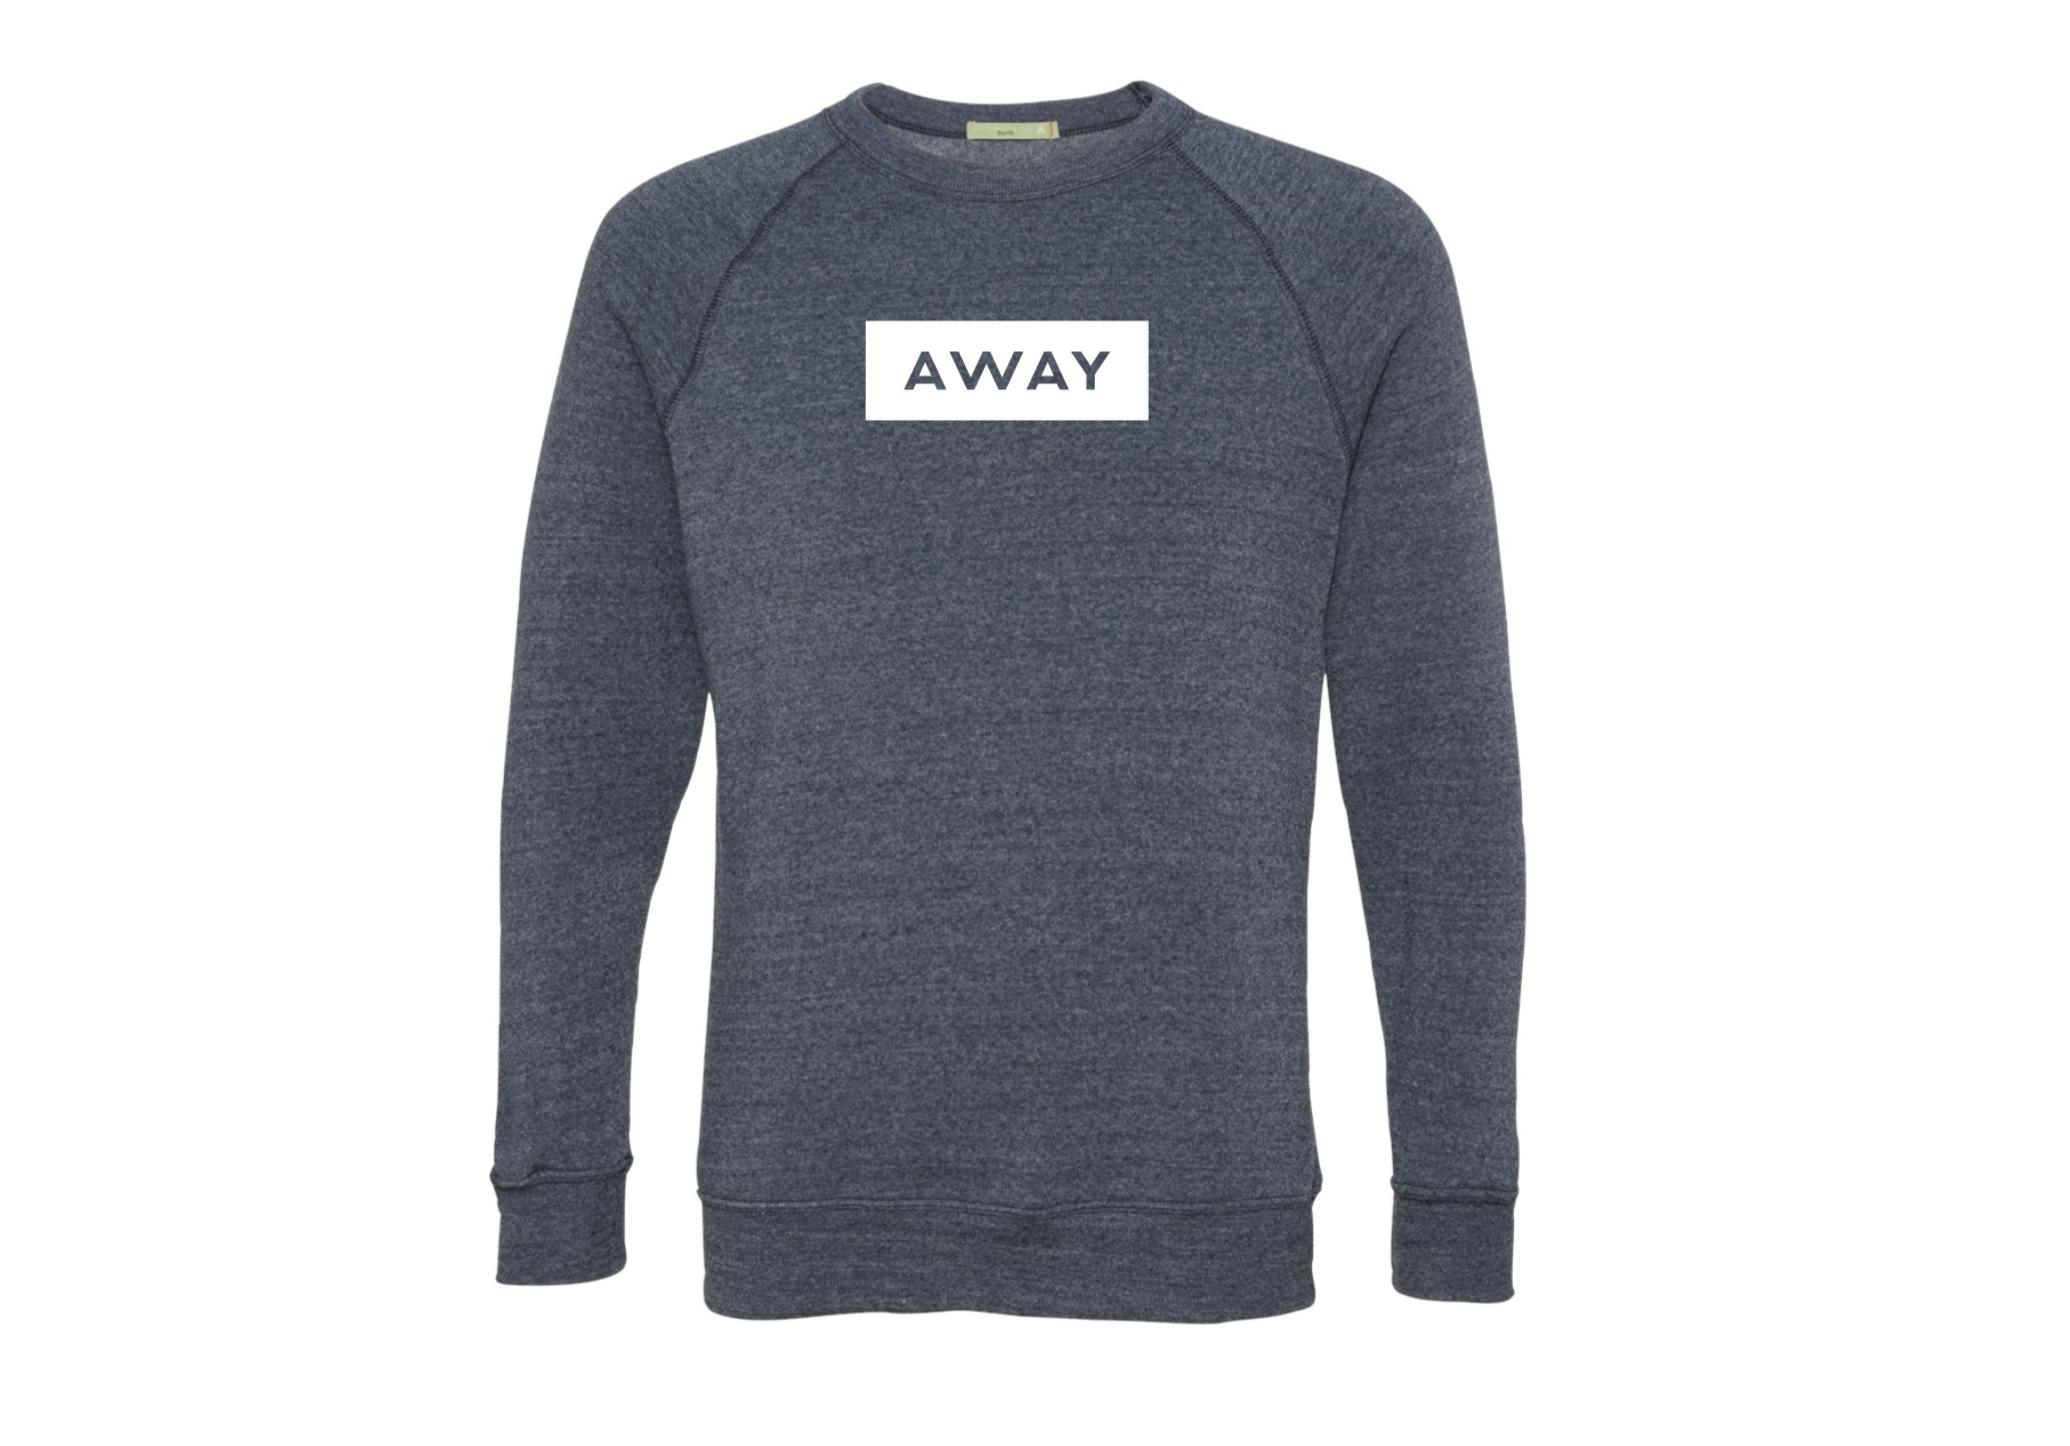 away travel sweatshirt.jpg